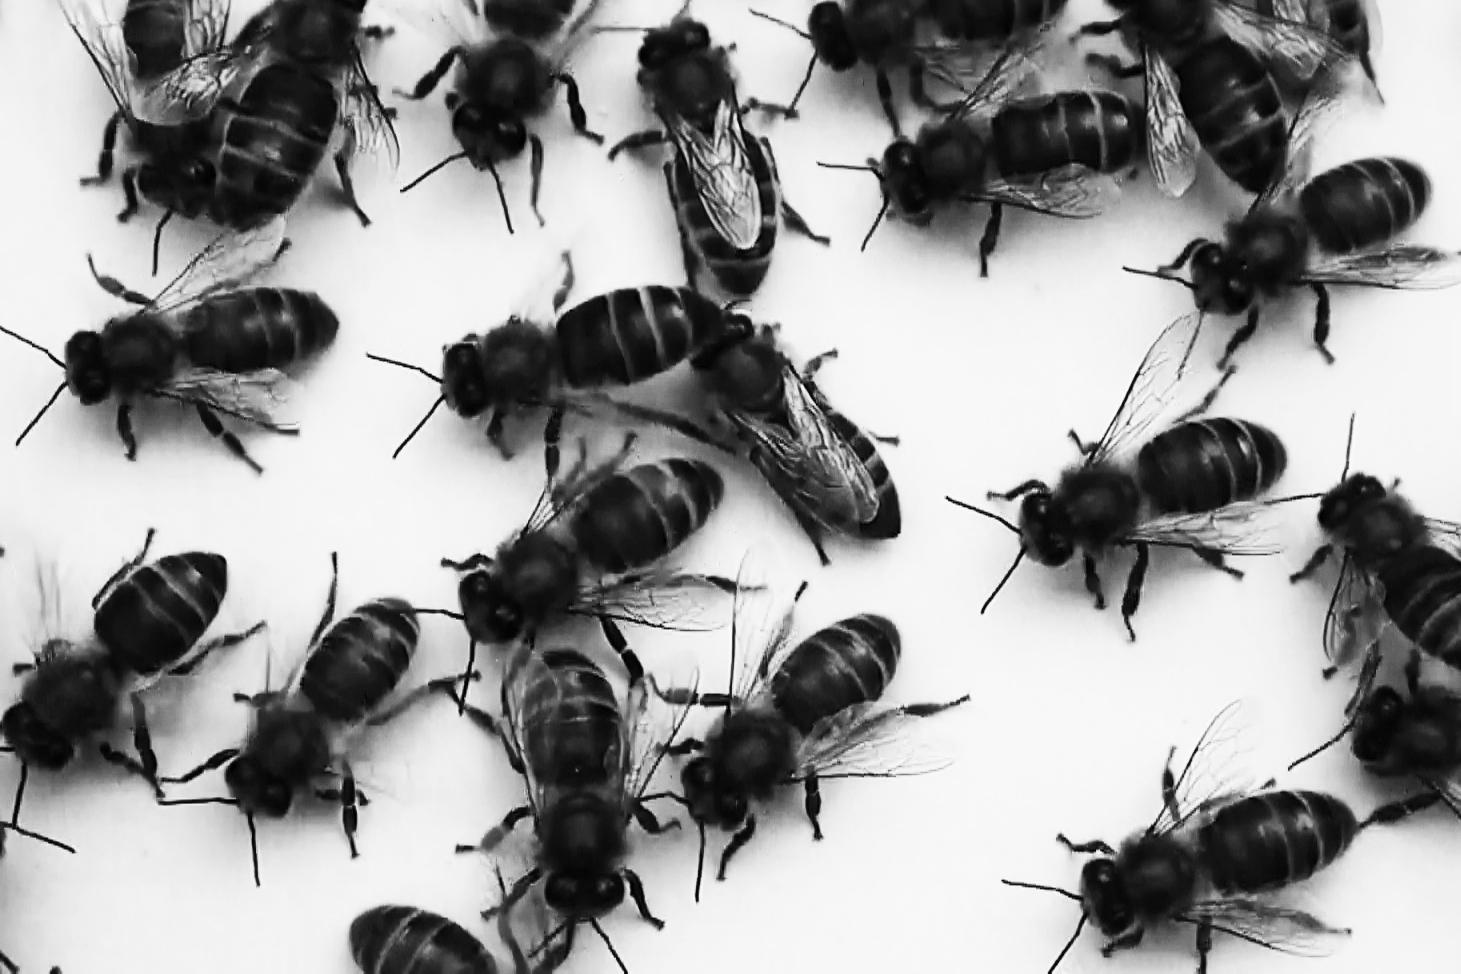 Bee Still2 cropped for website.jpg